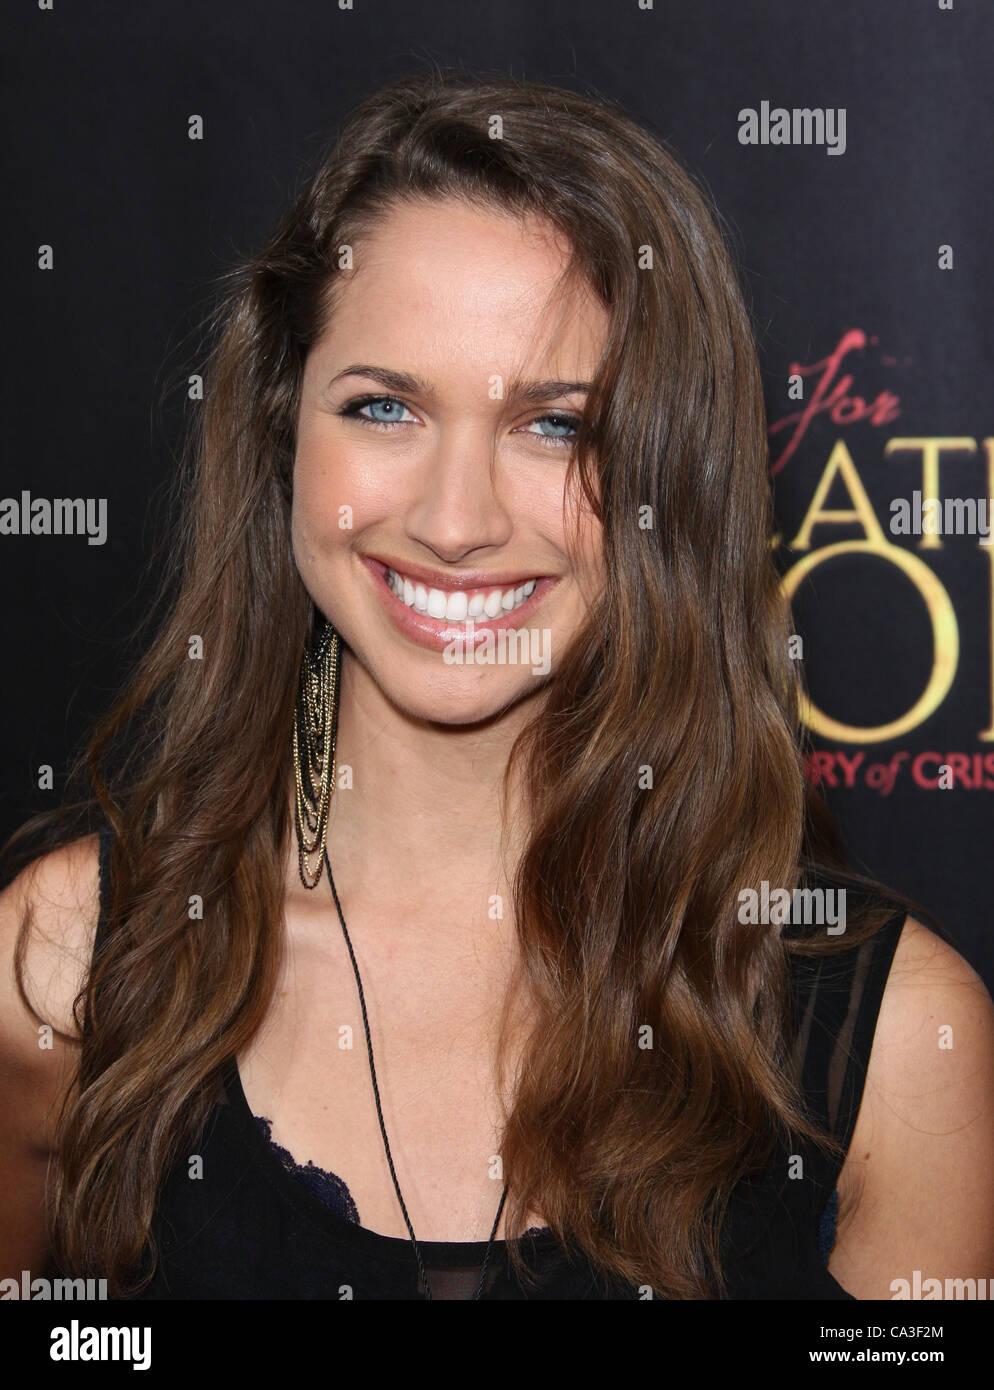 Tom Felton (born 1987),Dominic Mafham (born 1968) Erotic pic Rebecca Herbst born May 12, 1977 (age 41),Emily Rose (actress)